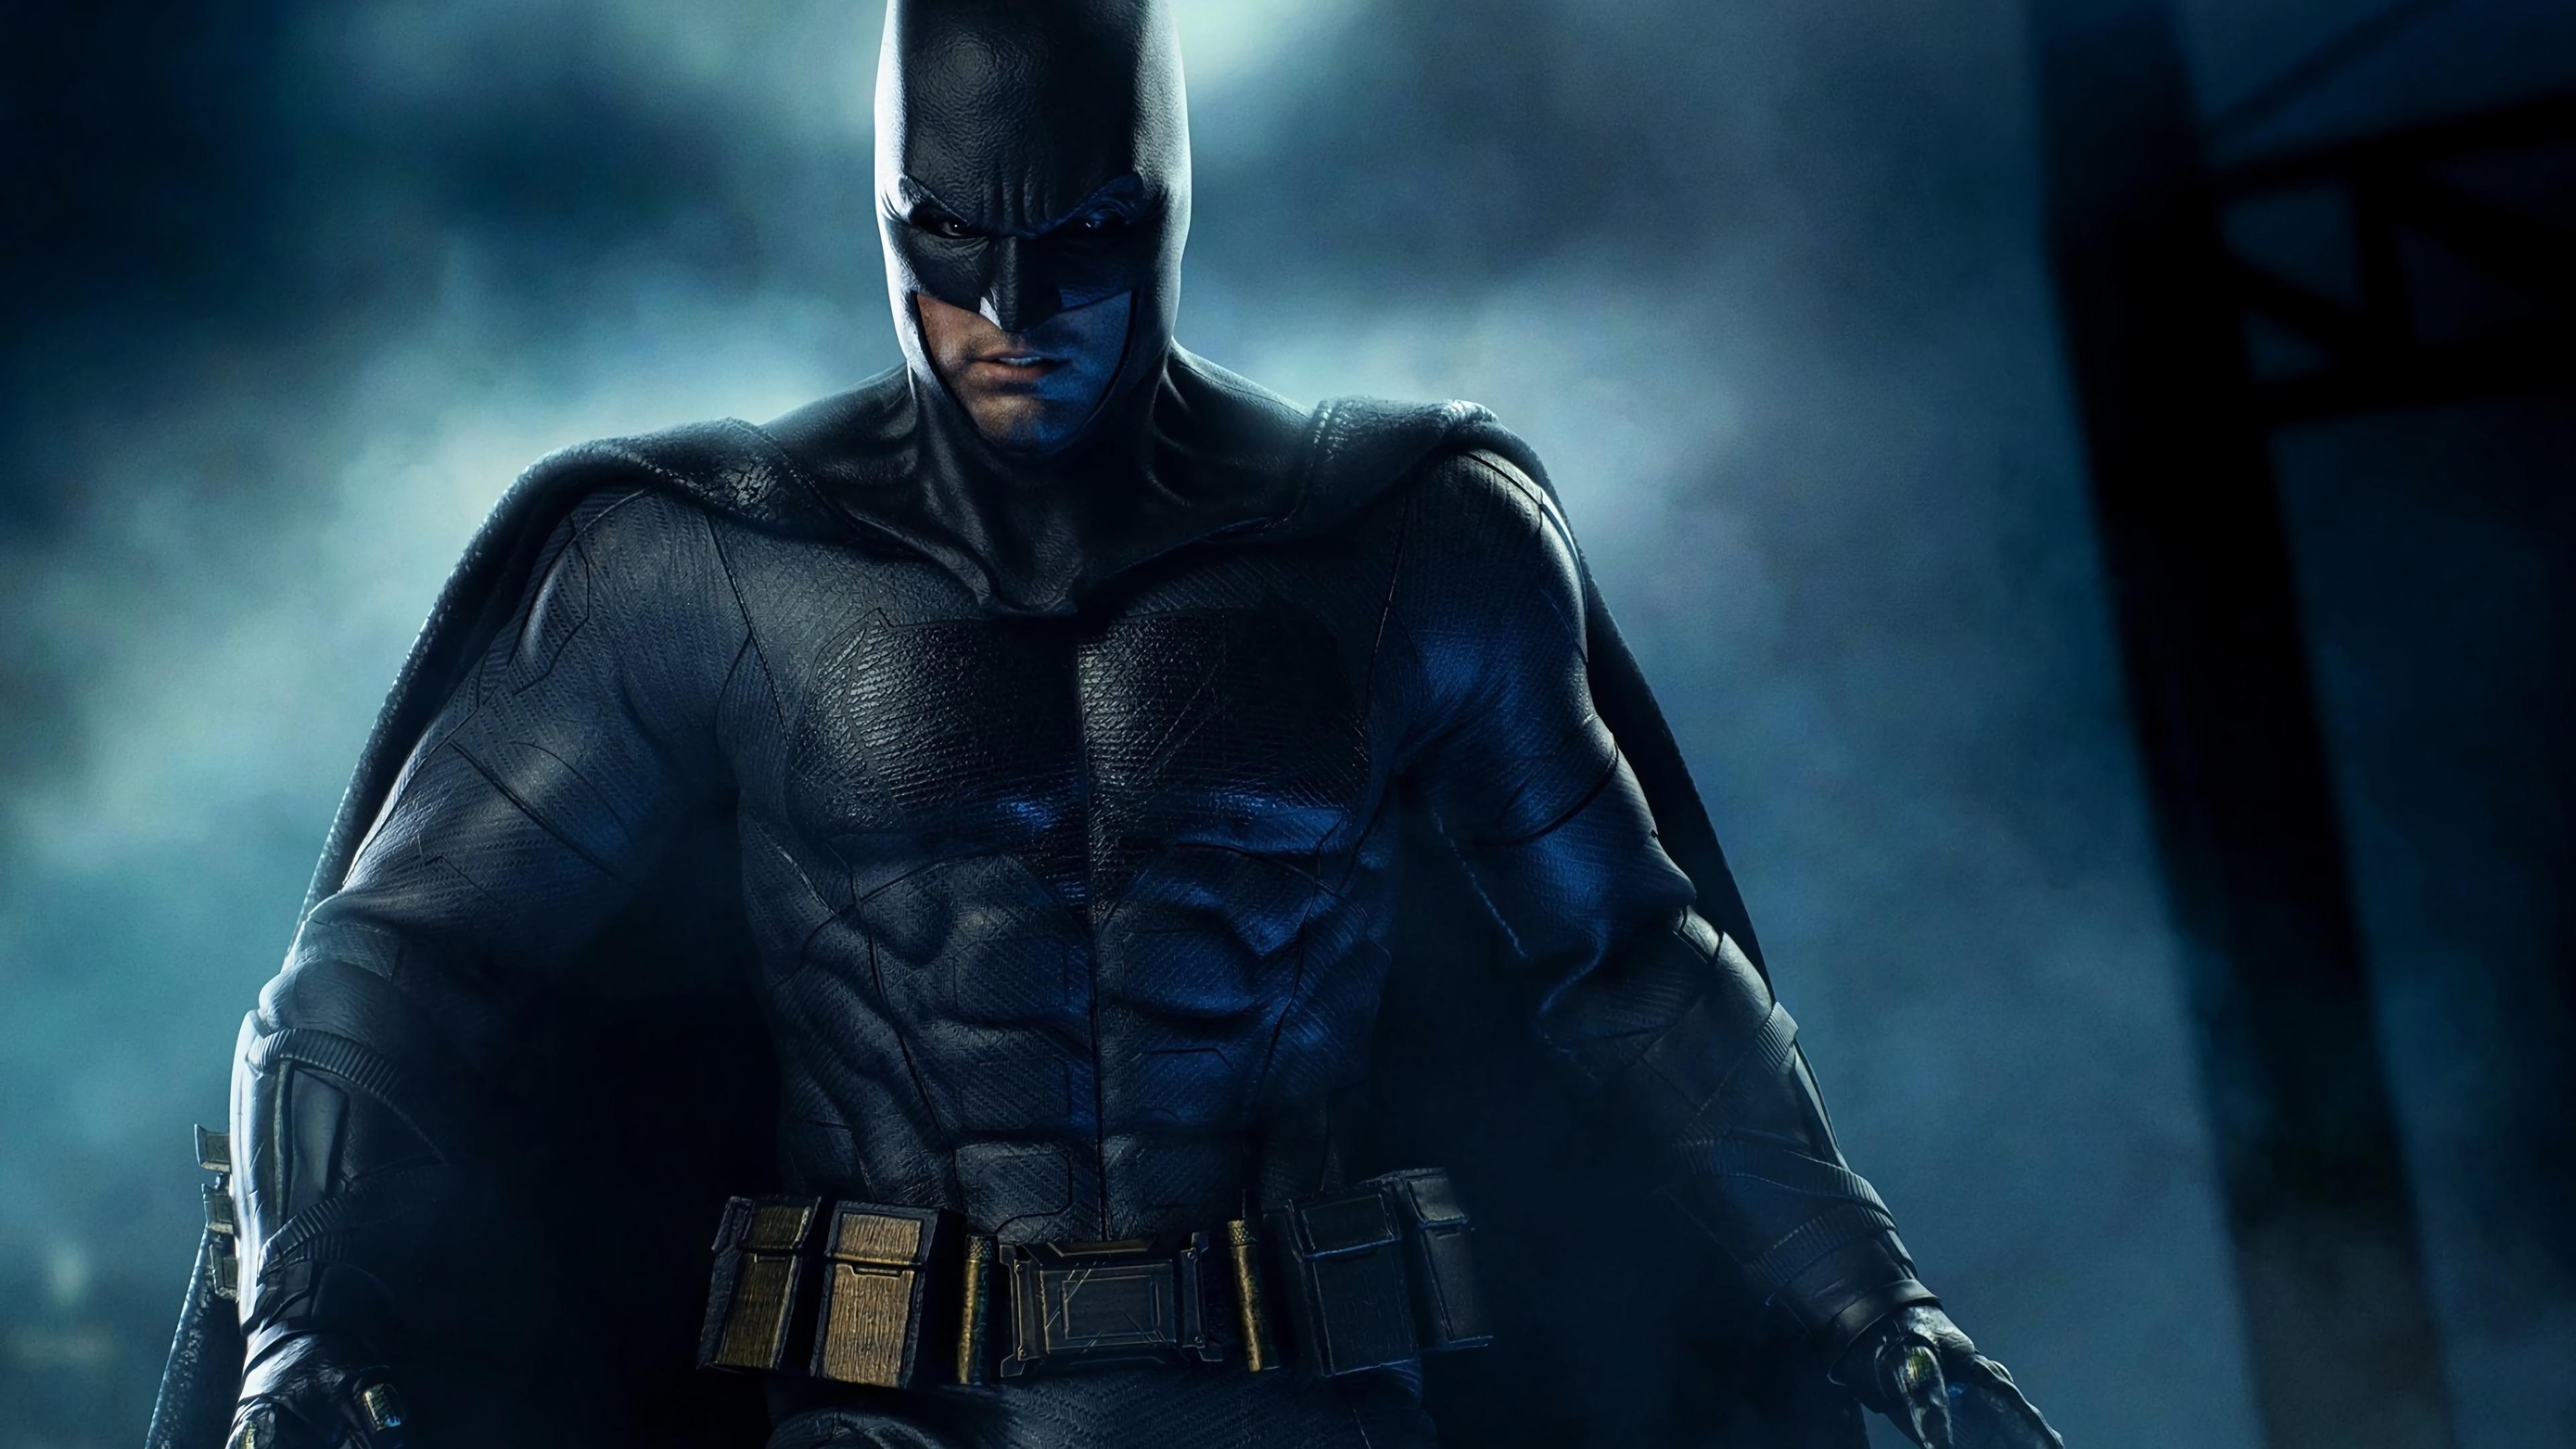 new batman dark art 1569186373 - New Batman Dark Art - superheroes wallpapers, hd-wallpapers, digital art wallpapers, batman wallpapers, artwork wallpapers, 4k-wallpapers